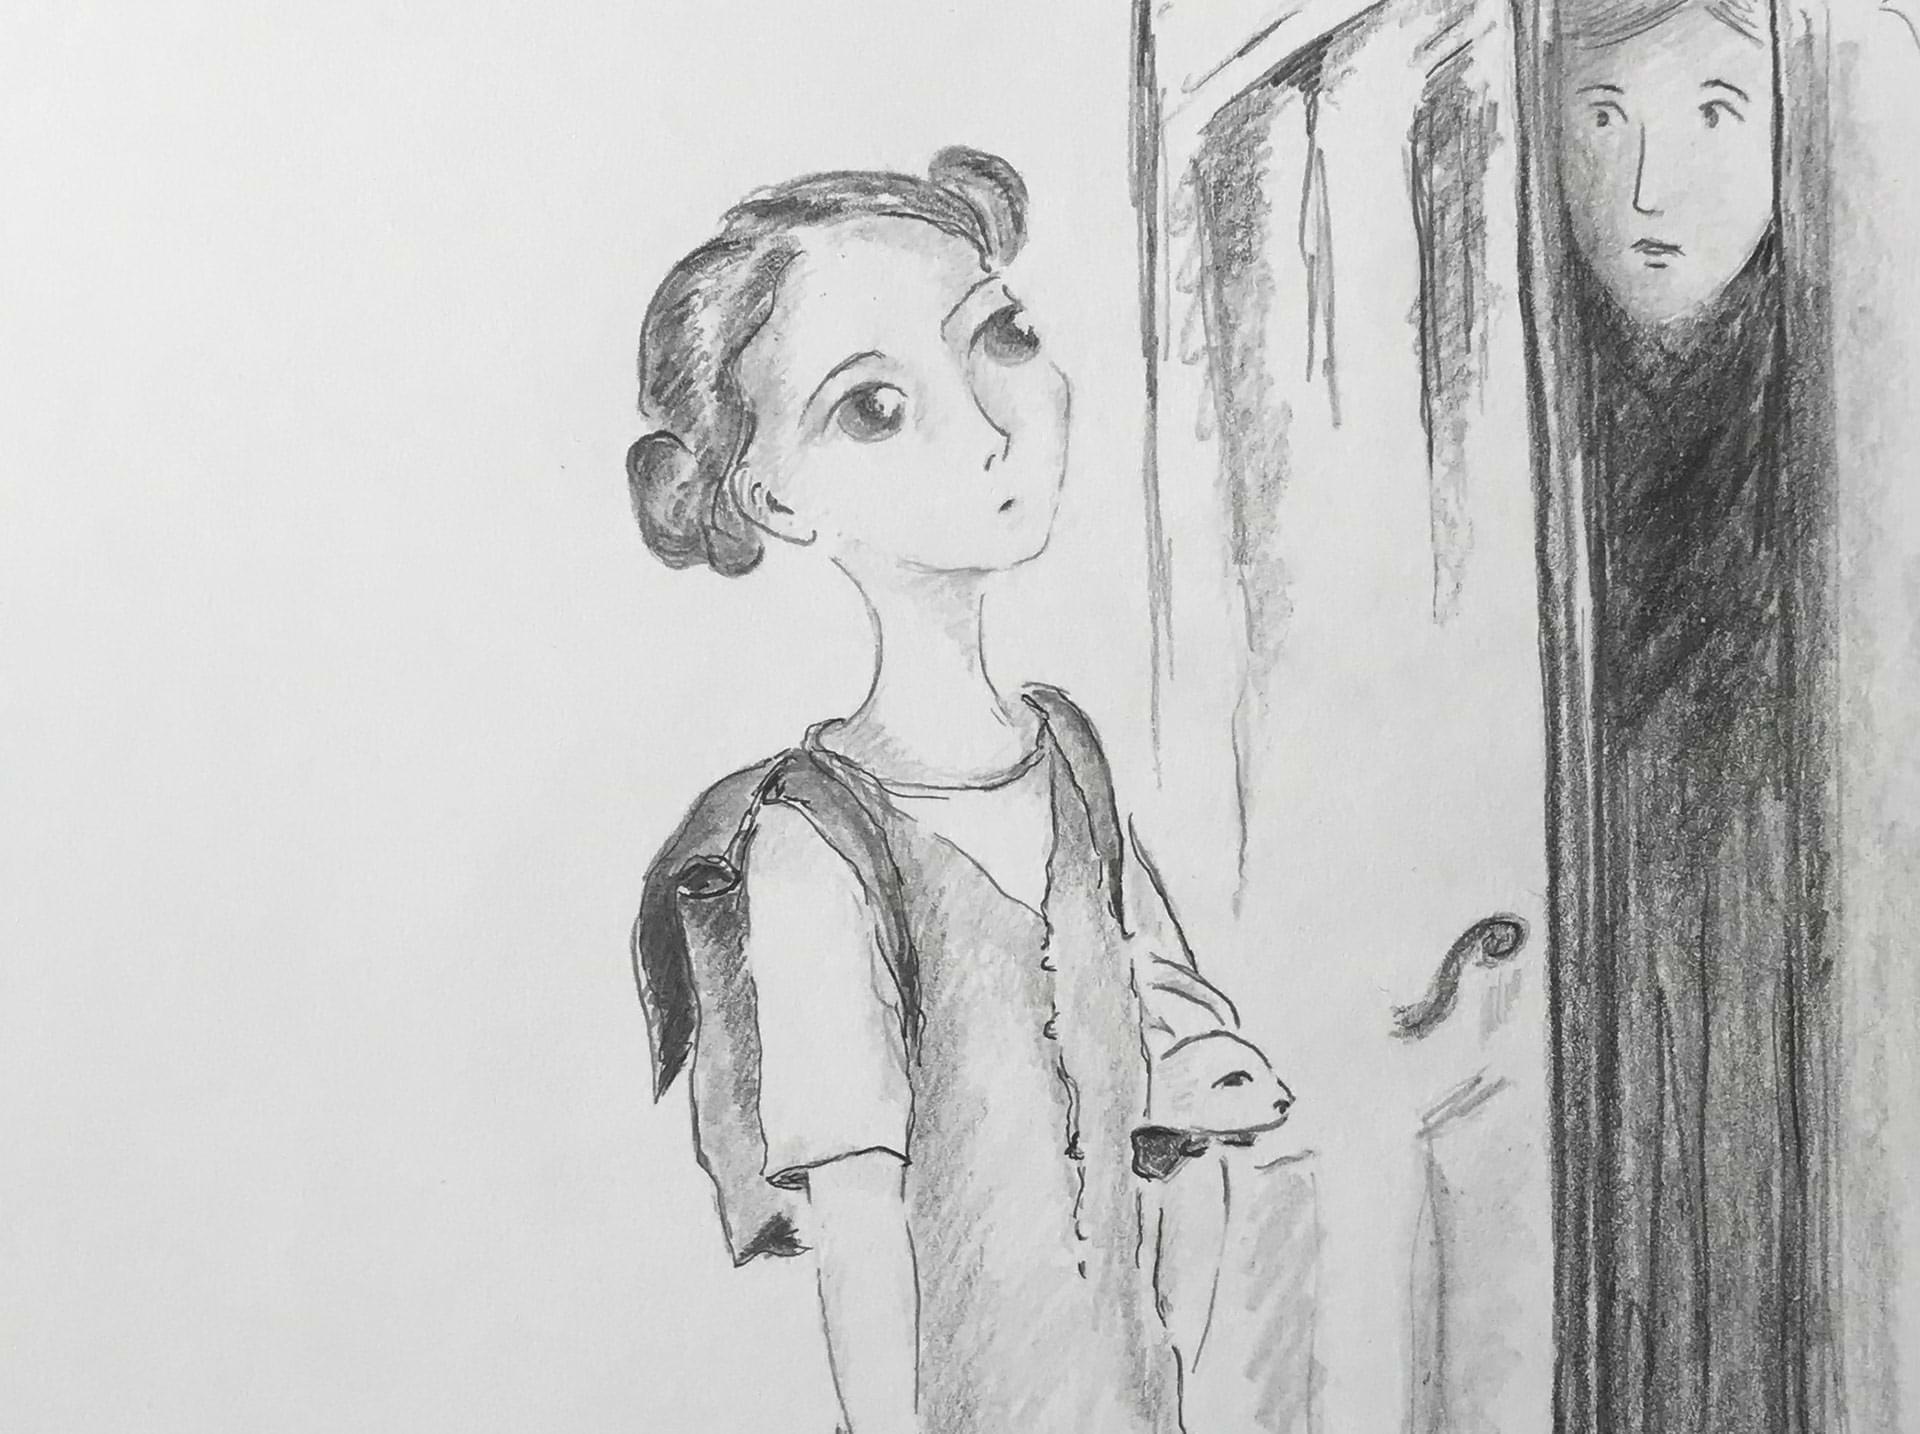 christianehaag-zeichnung-drawing-kunst-art-graphicnovel